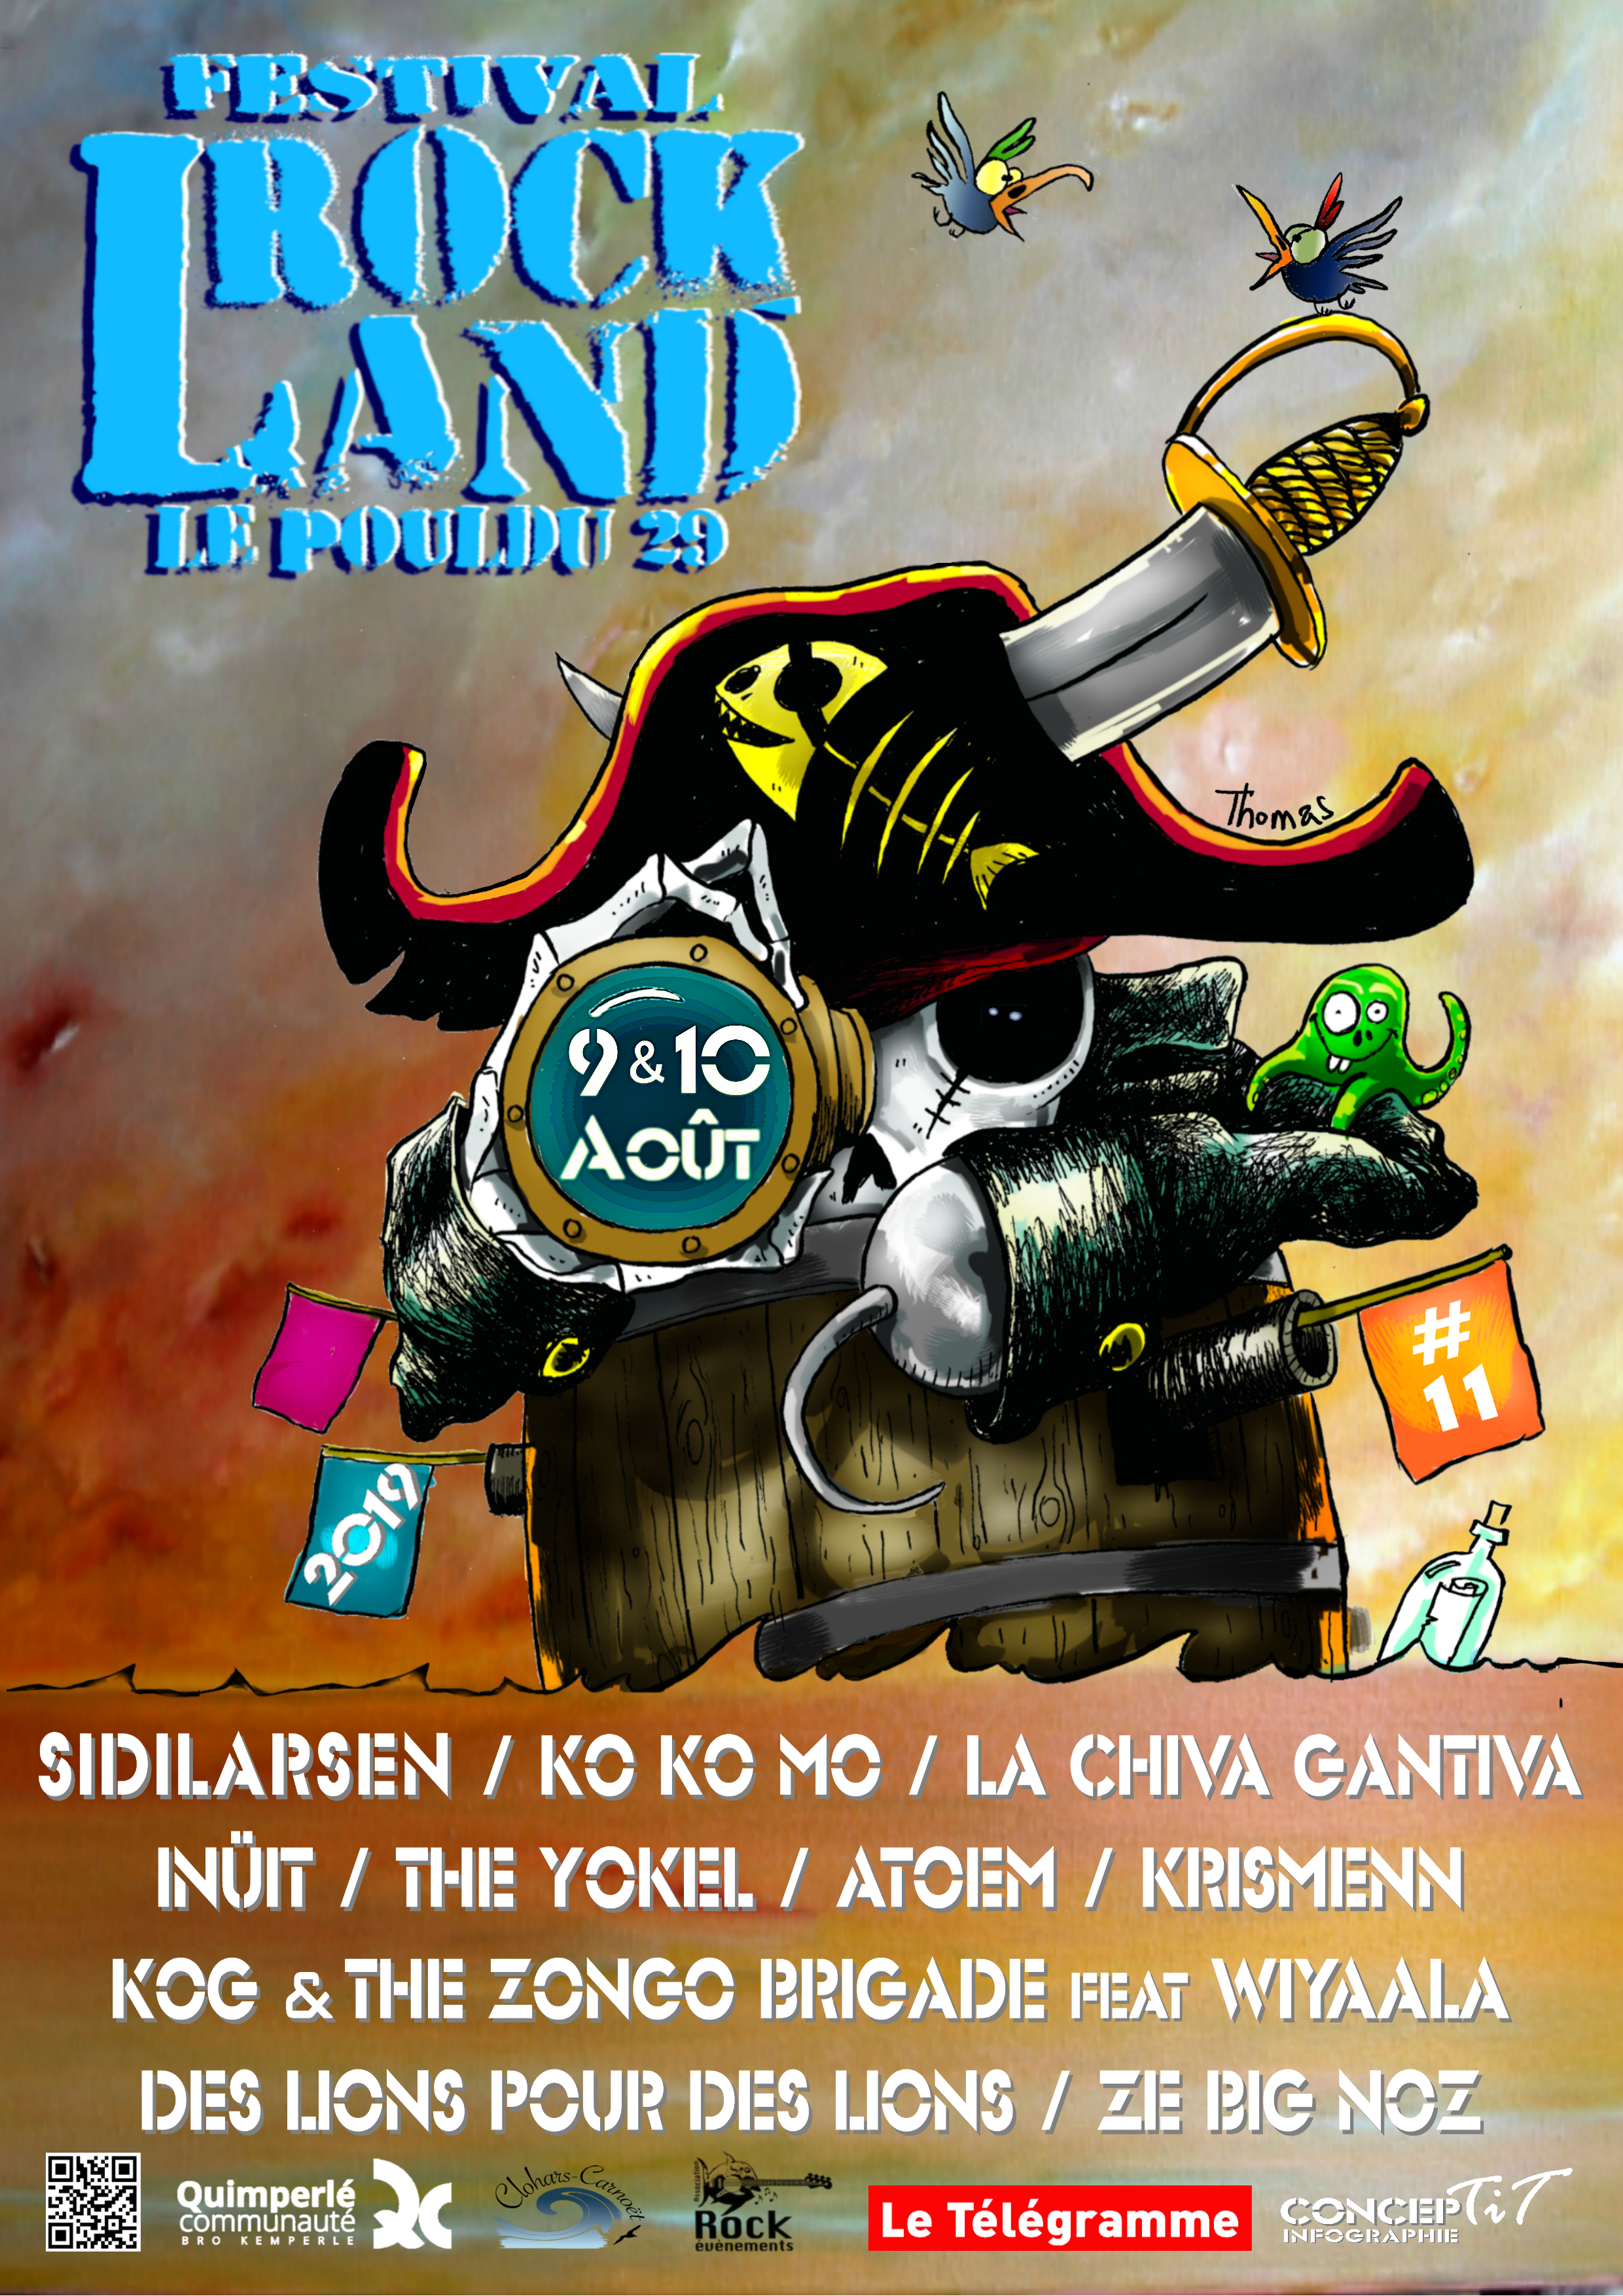 Festival Rock-Land 2019